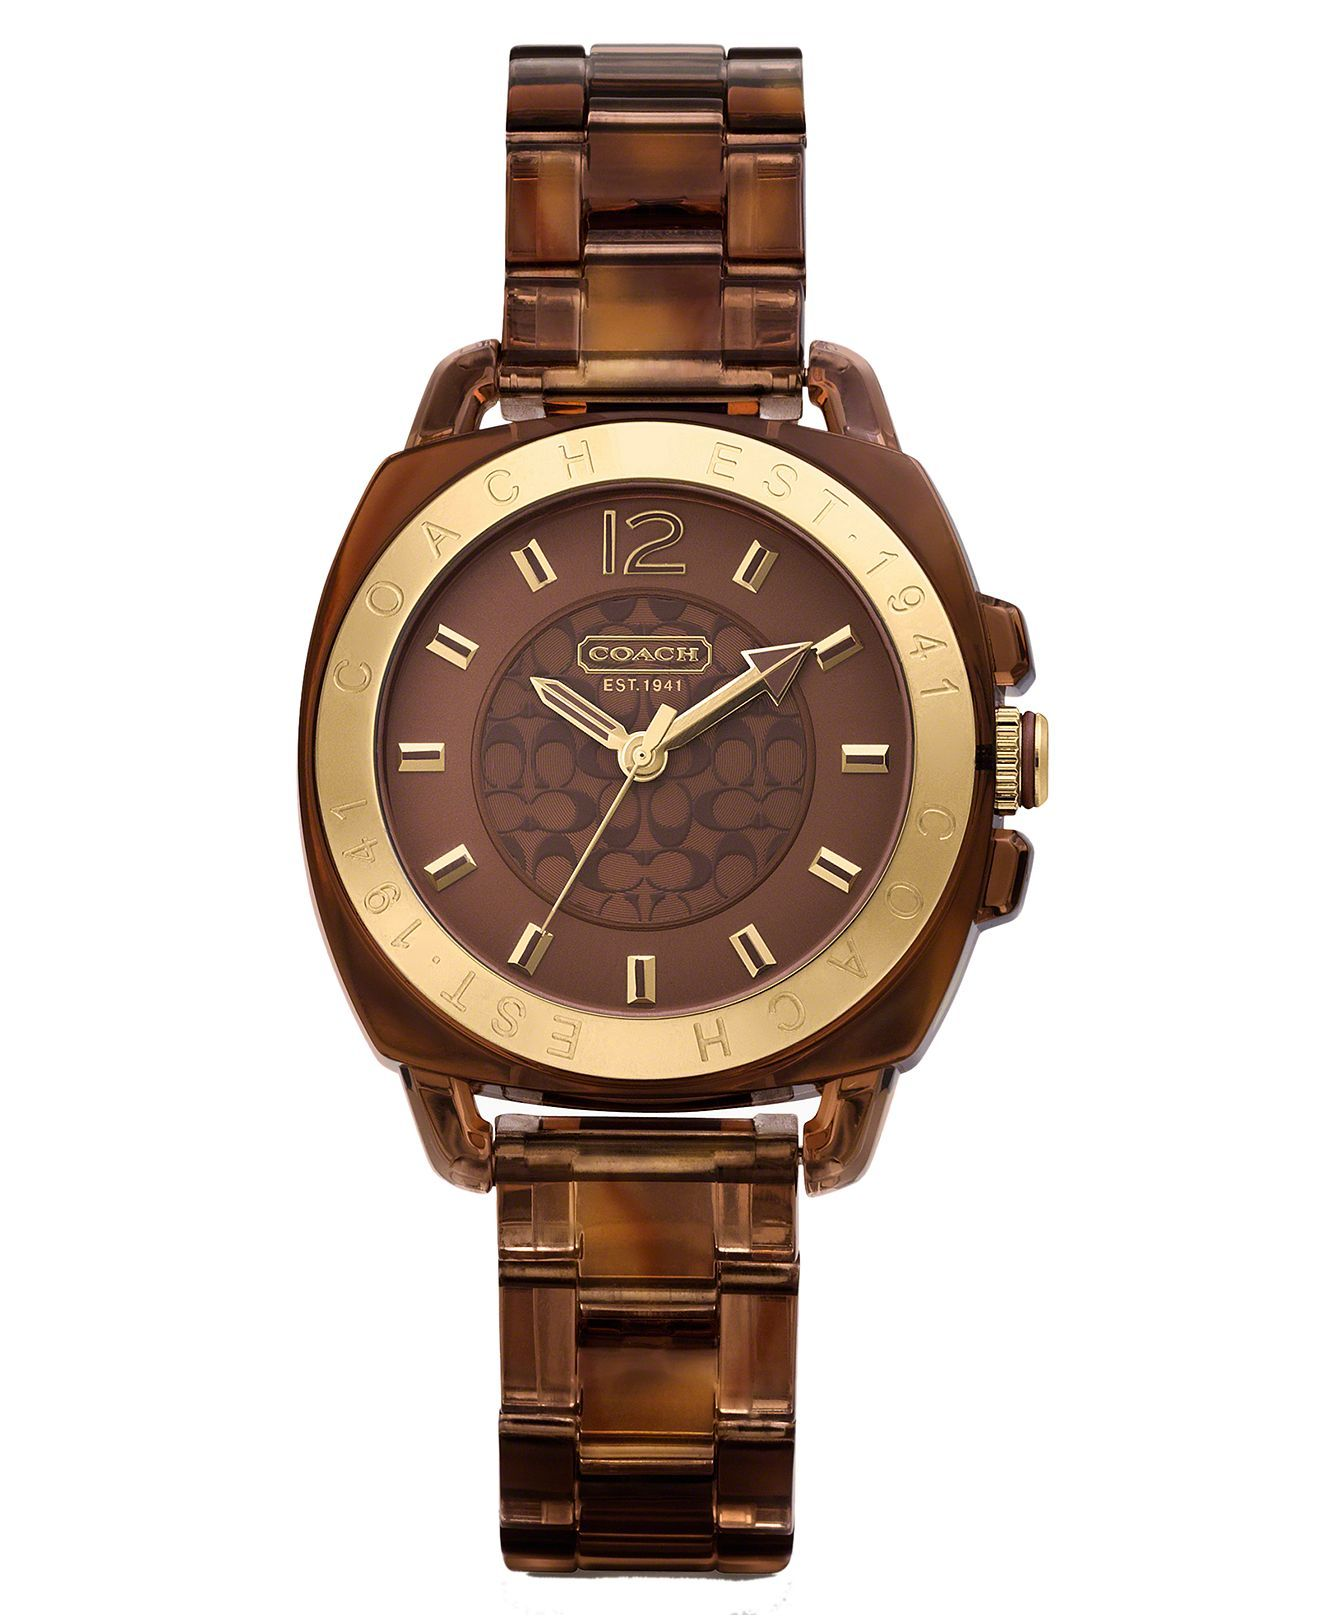 COACH BOYFRIEND BRACELET WATCH - Women's Watches - Jewelry ...